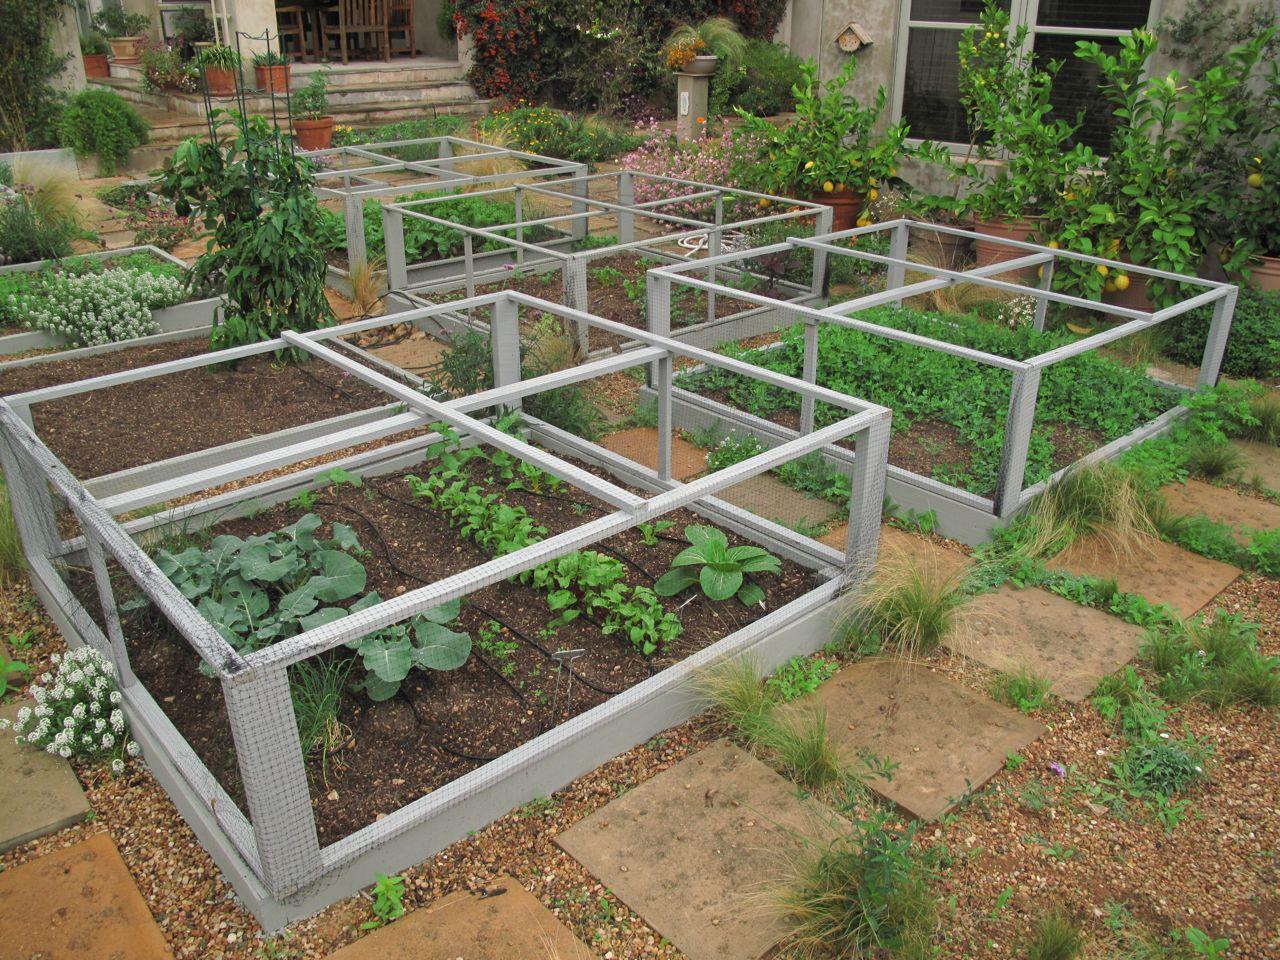 Garden Design For Raised Beds: ROCK ROSE: I'M GOING ALL FANCY